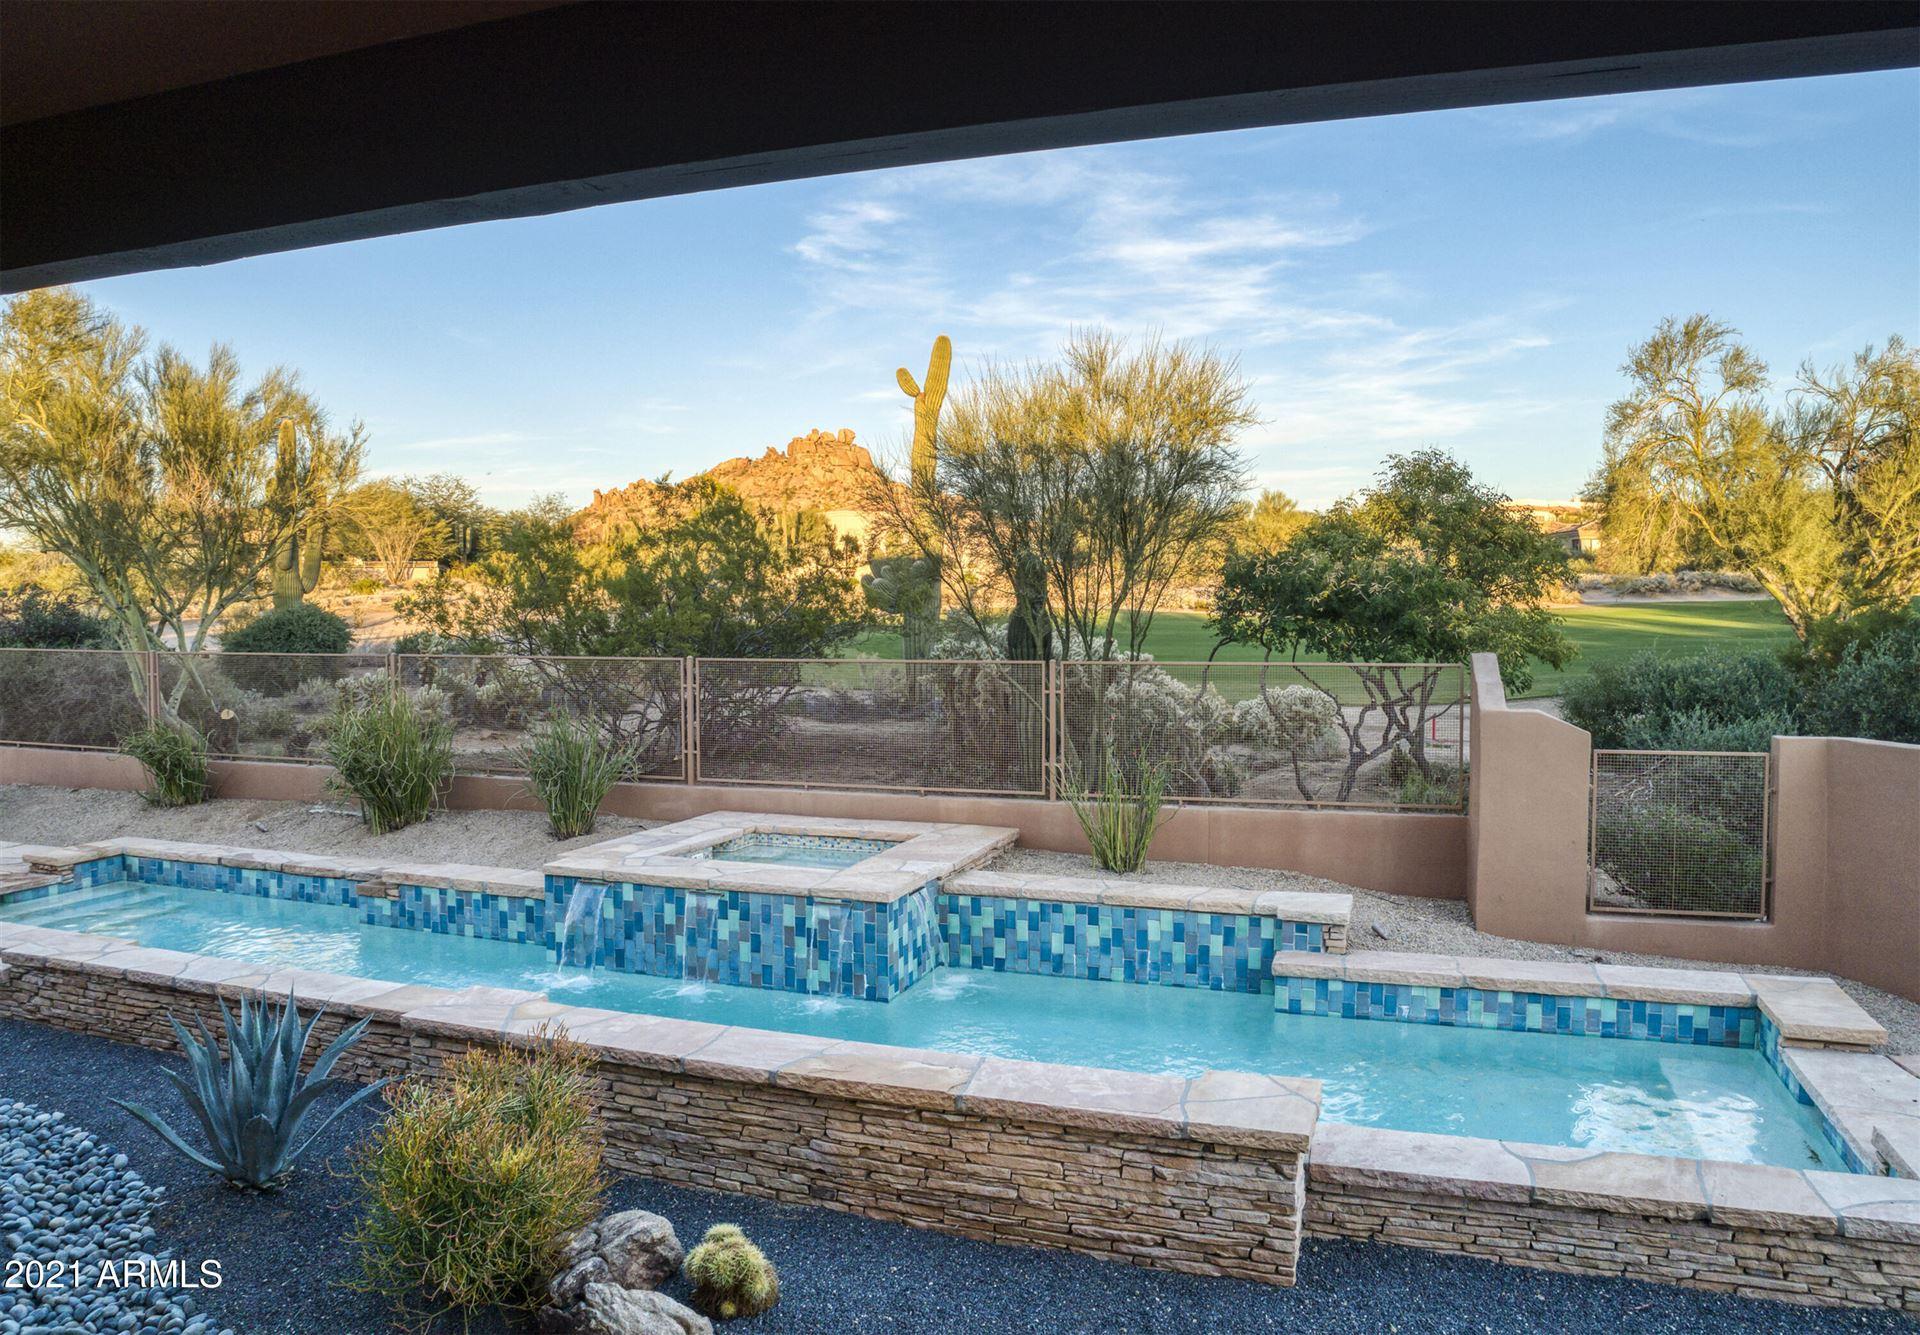 26425 N 107TH Way, Scottsdale, AZ 85255 - MLS#: 6240900